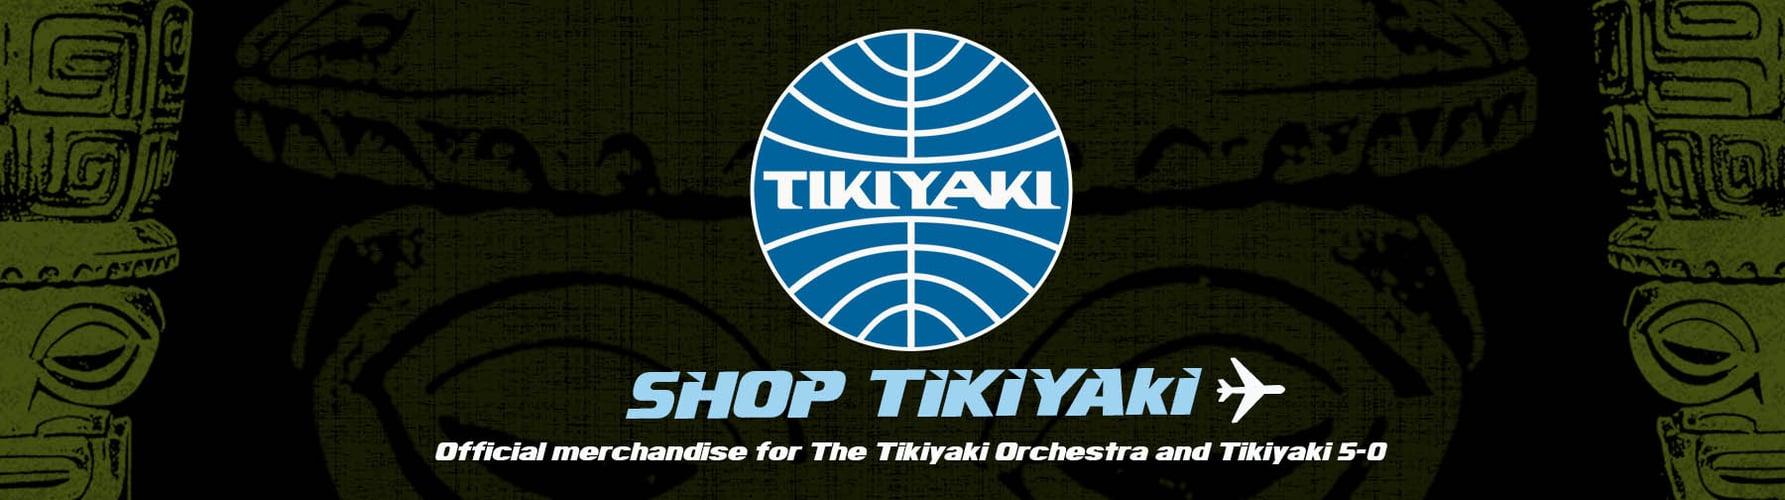 Shop Tikiyaki